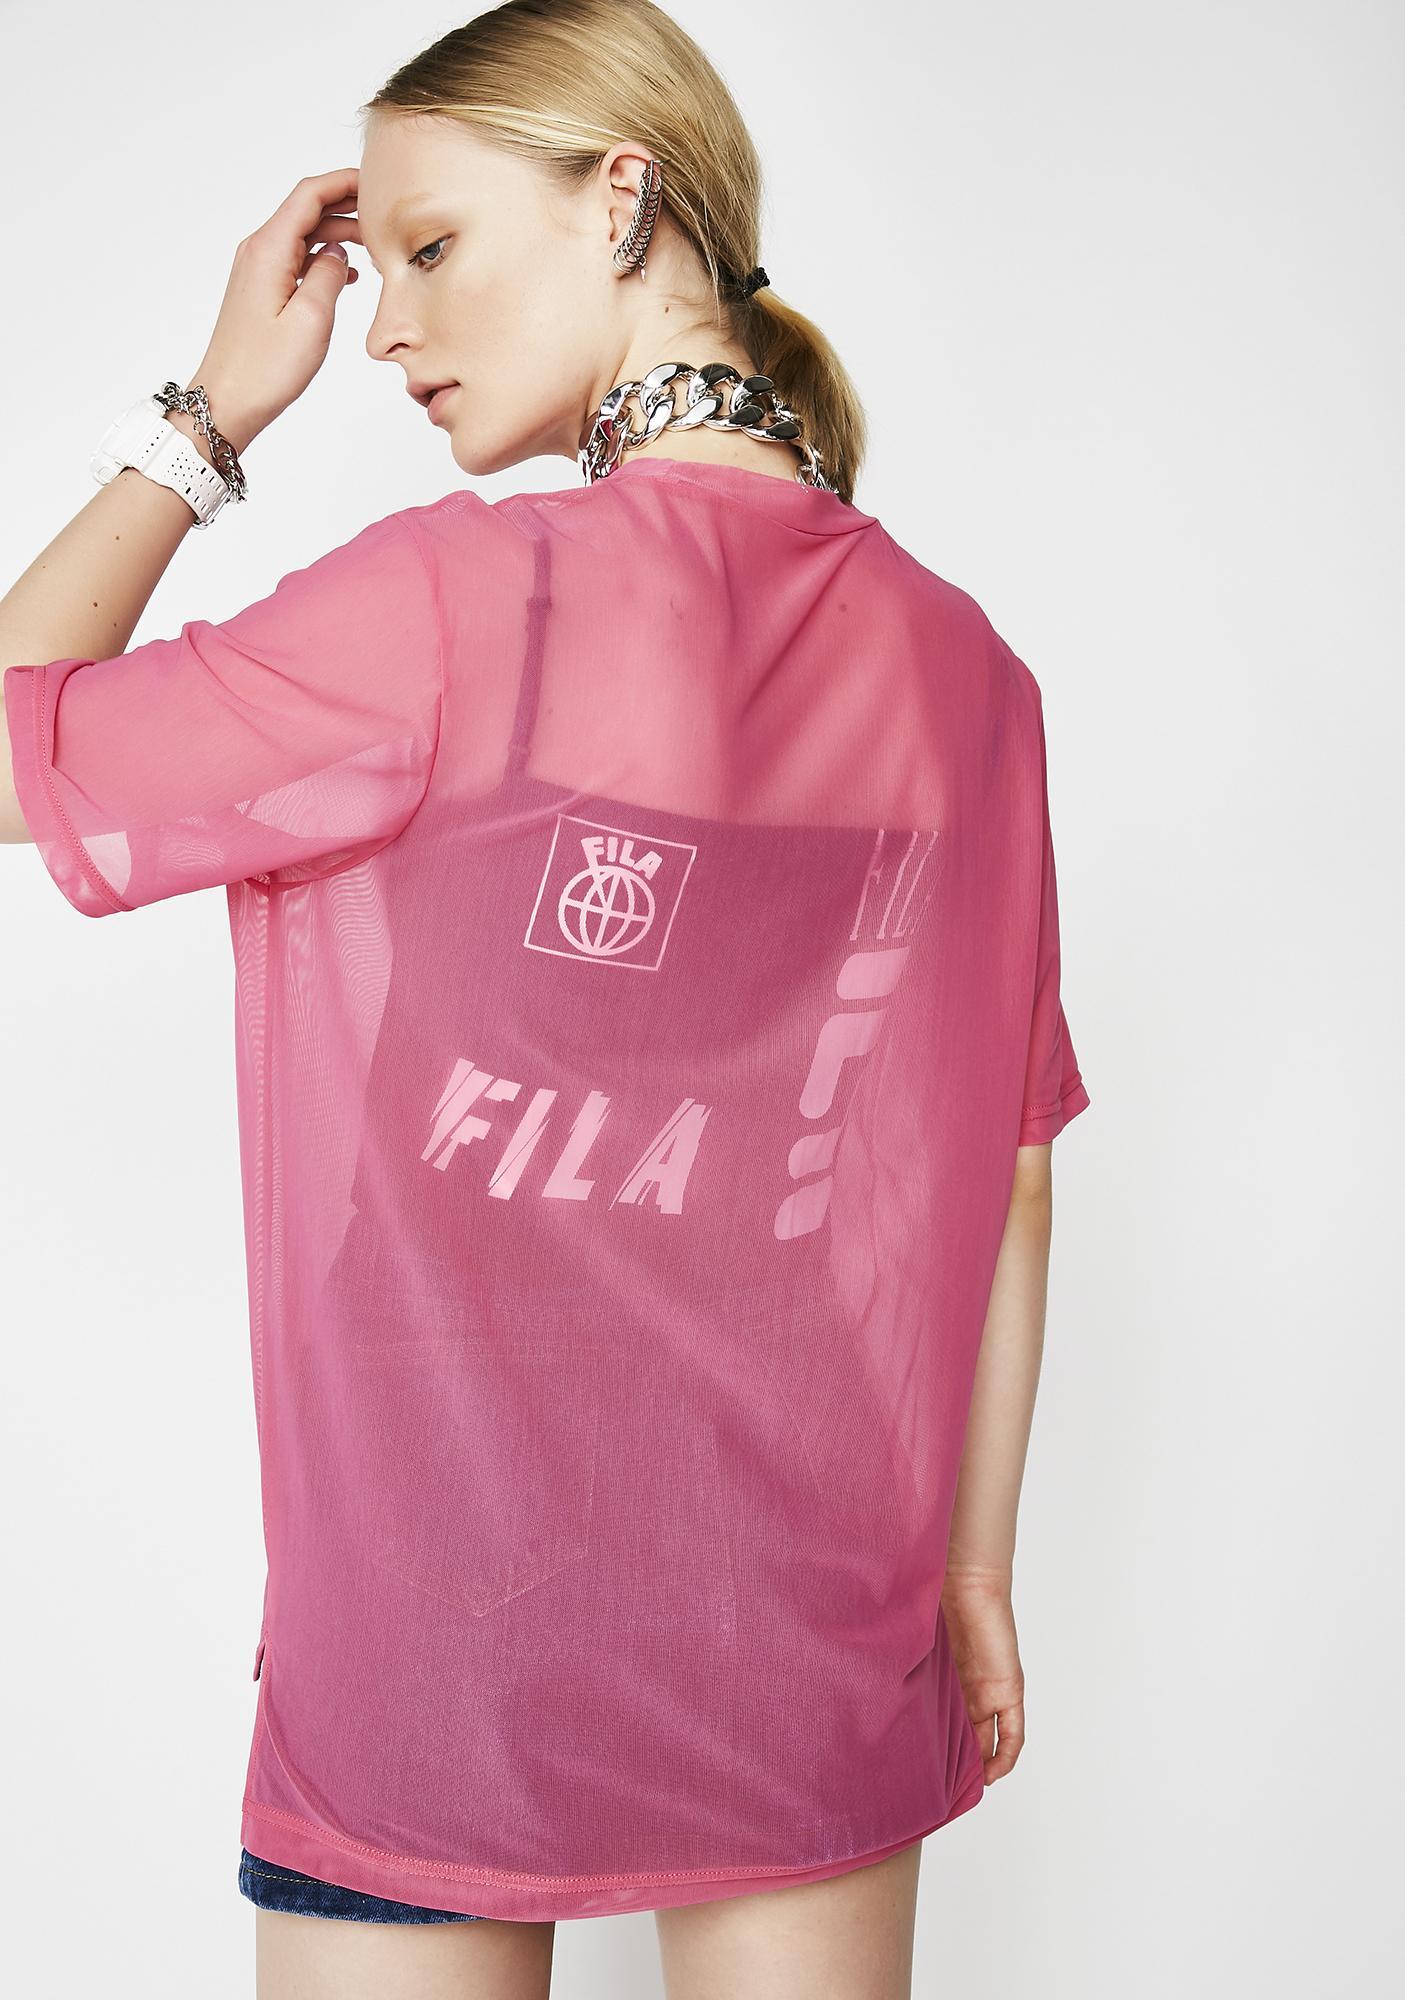 Fila Zen Double Layer Top